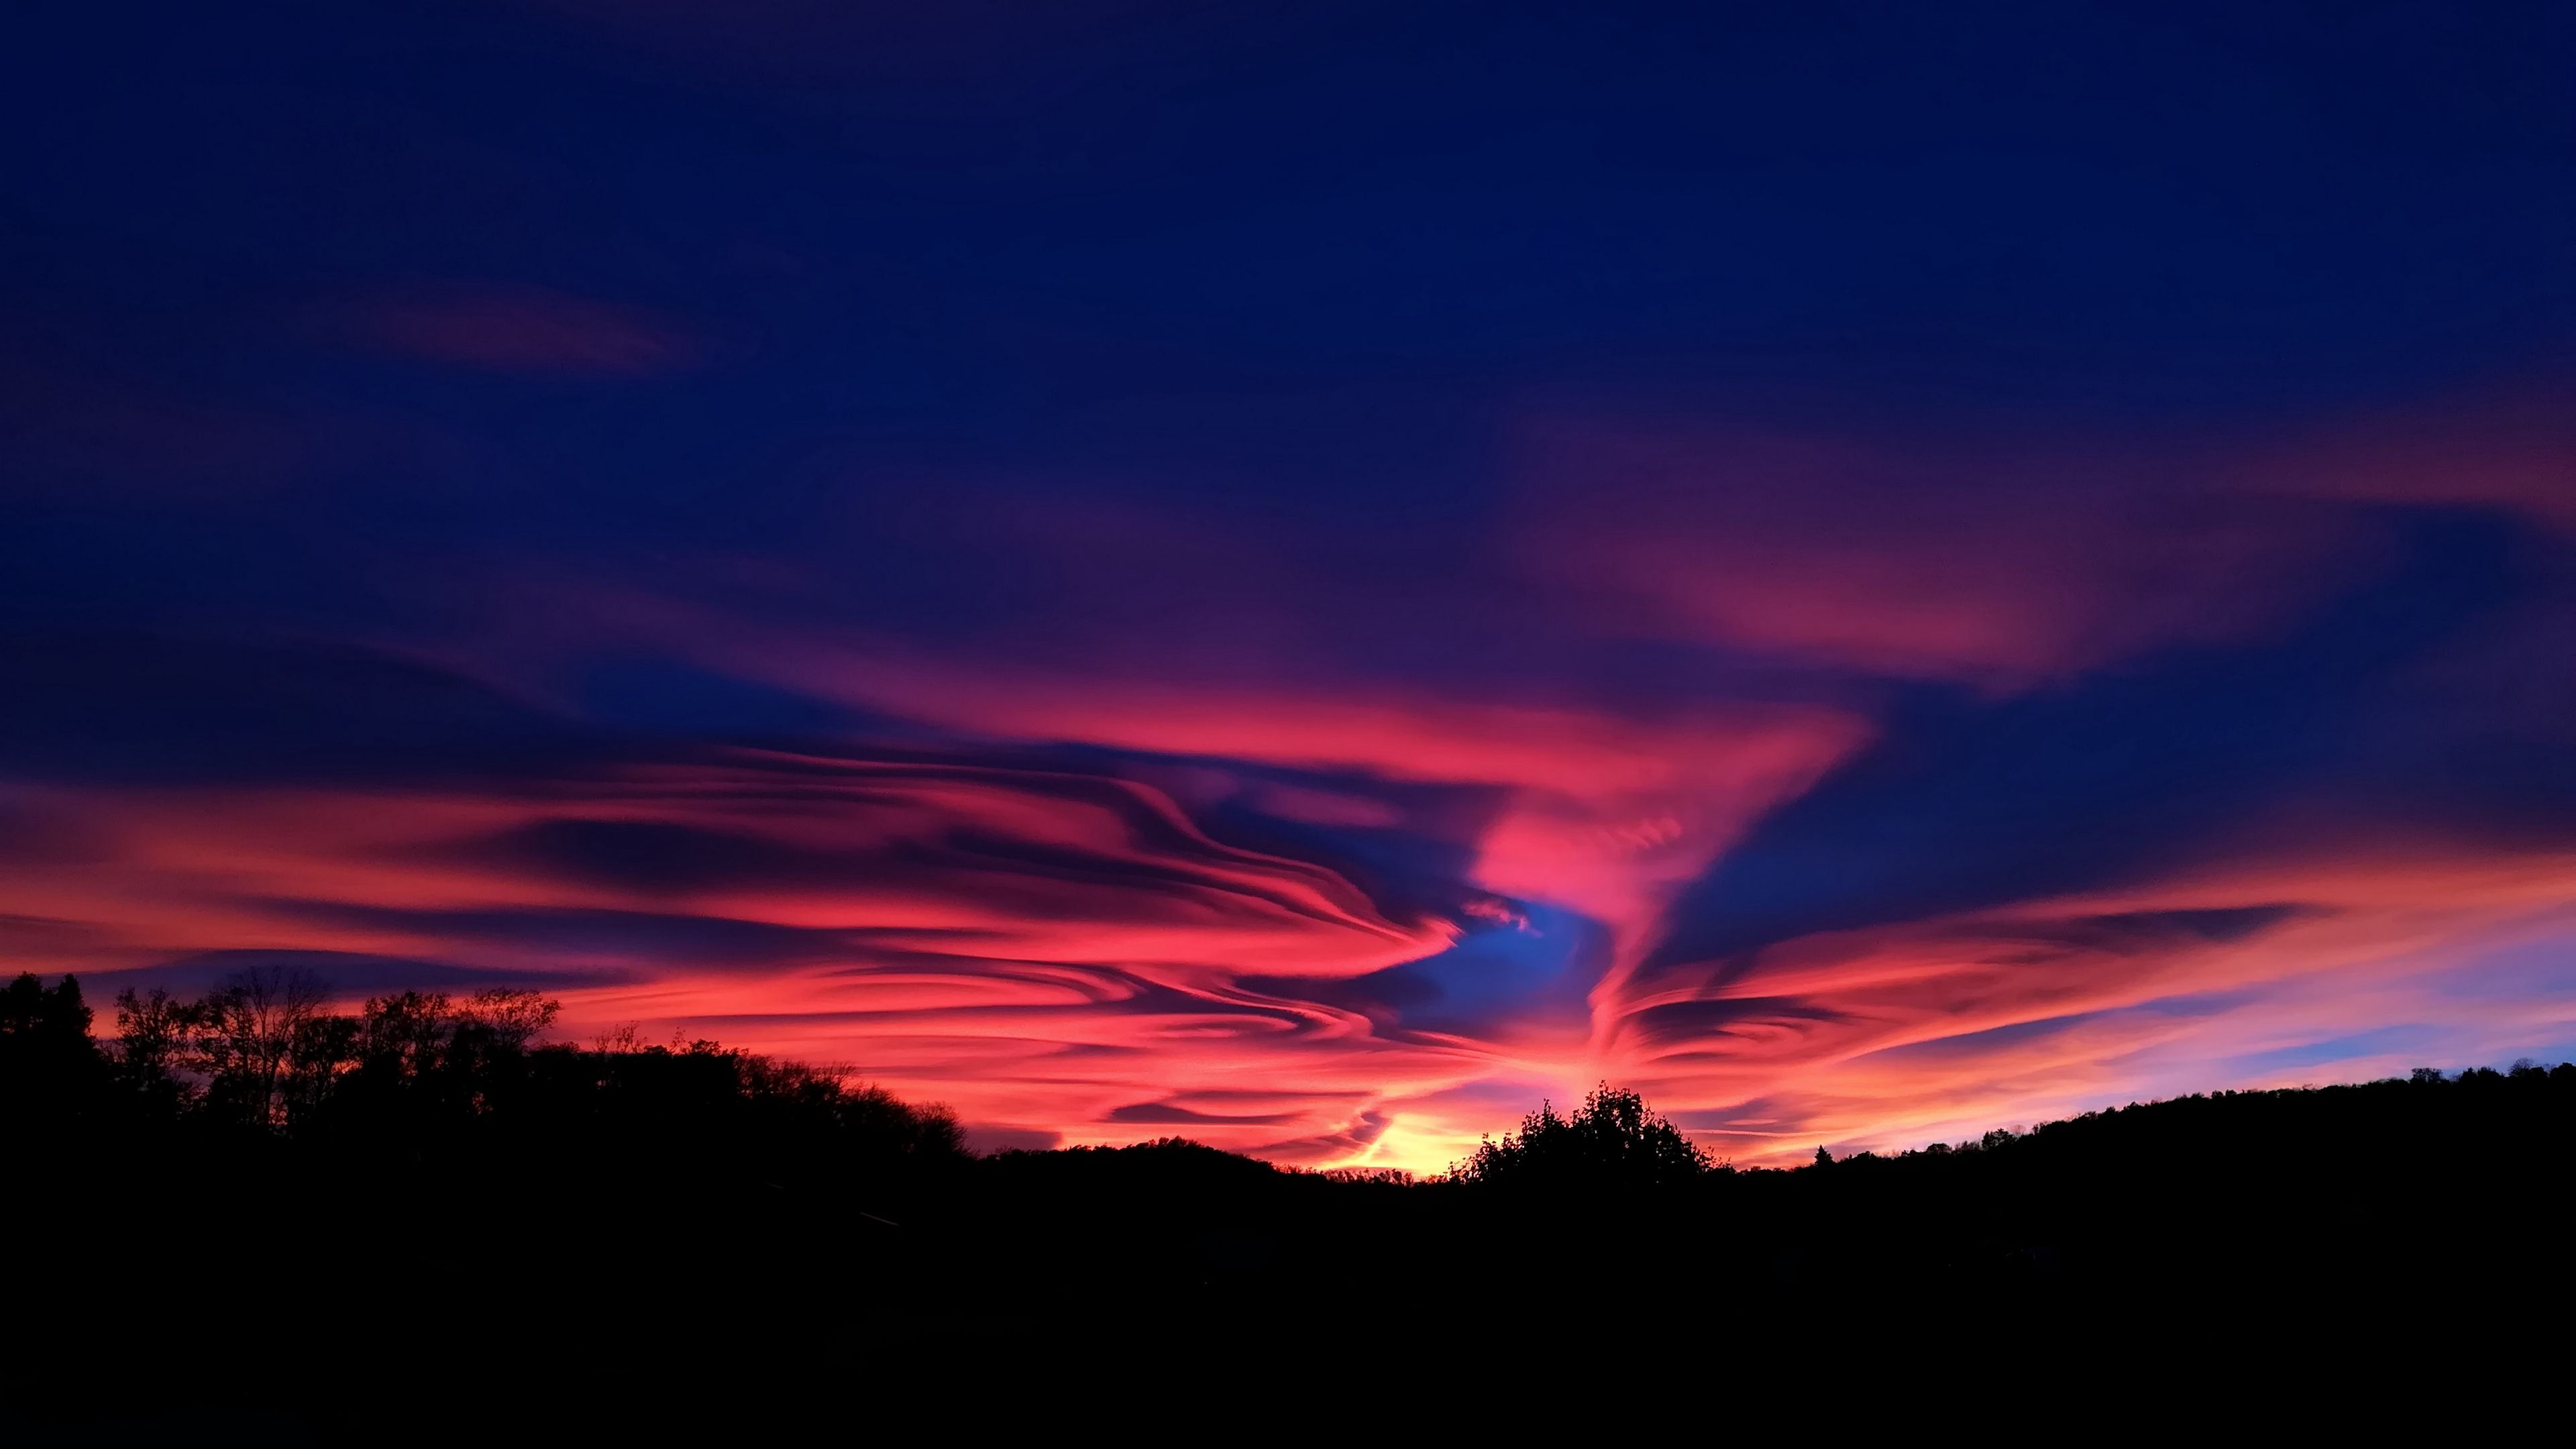 Sky Sunset Clouds 4k Sunset Sky Clouds Sunset Wallpaper Sunset Images Sunset